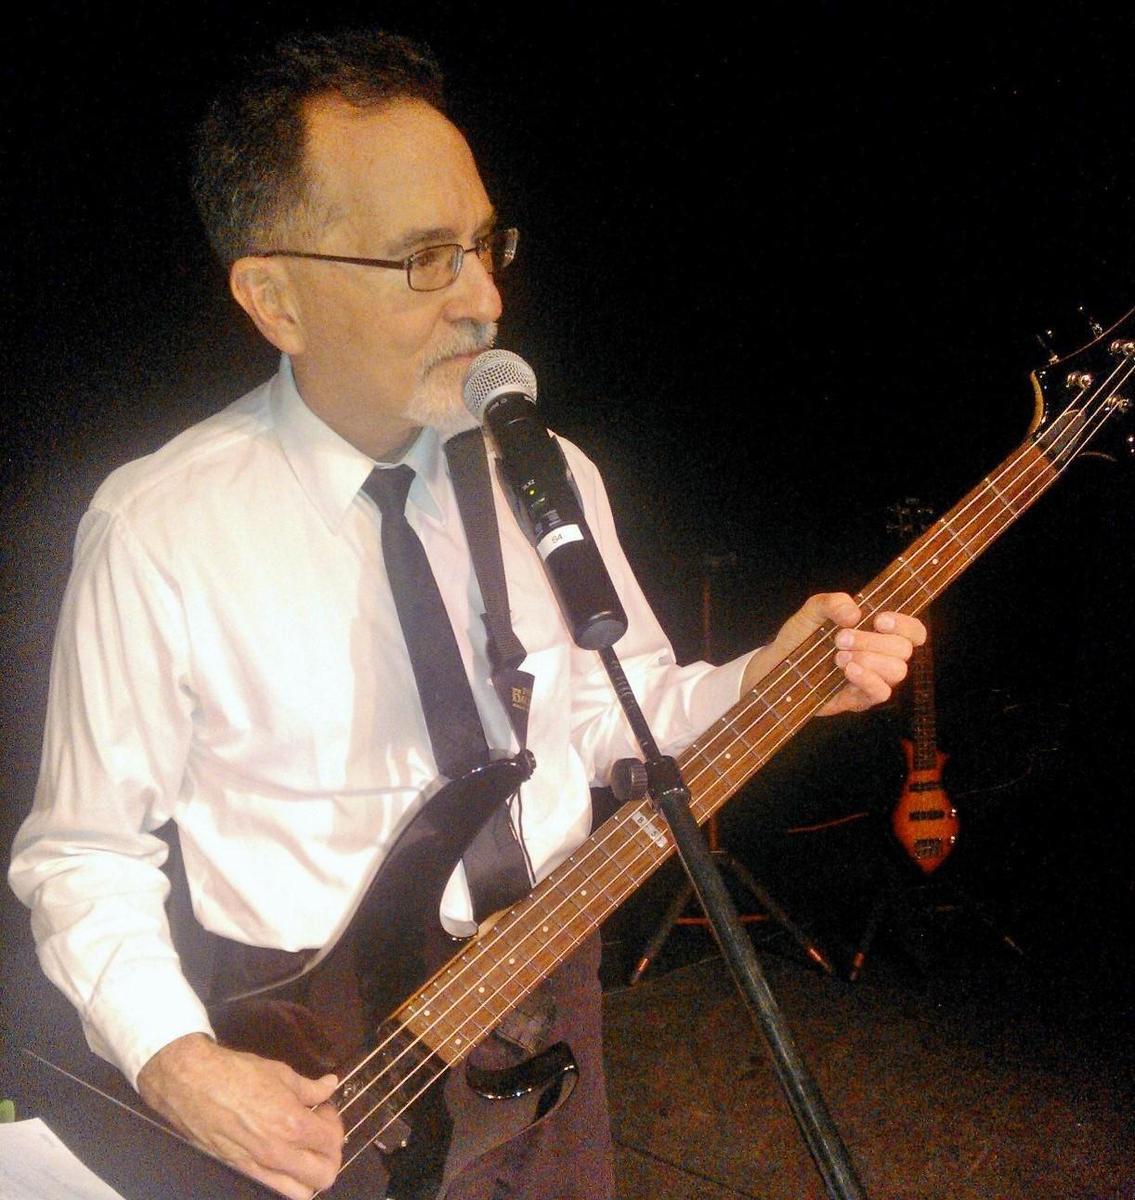 donald tharp on bass